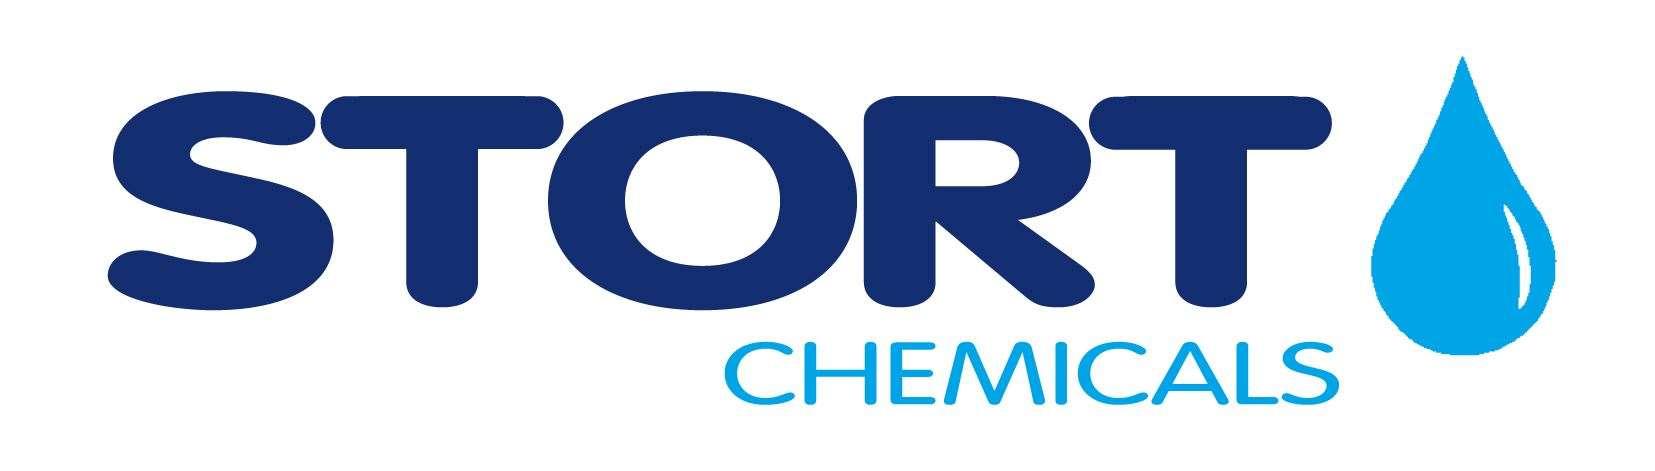 Stort Chemicals logo (52124522)